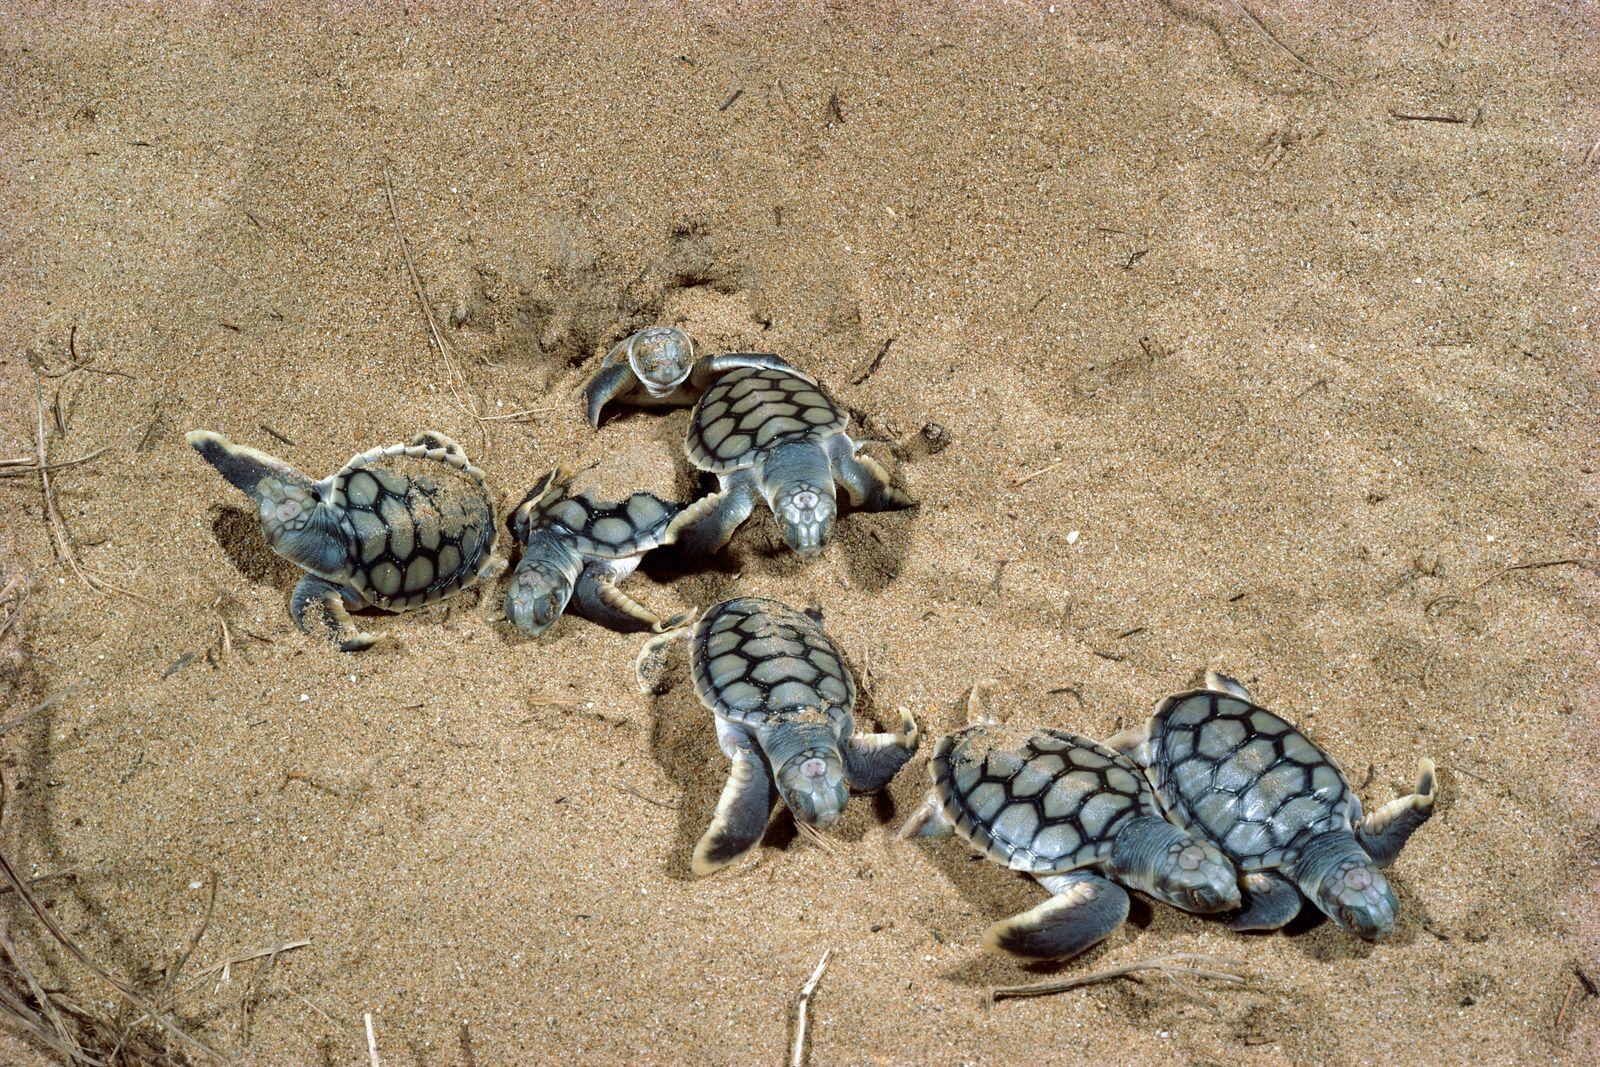 Flatback Turtles - Hatchlings emerging at night (Natator depressus). Mon Repos Beach, Bundaberg, Queensland, Australia.